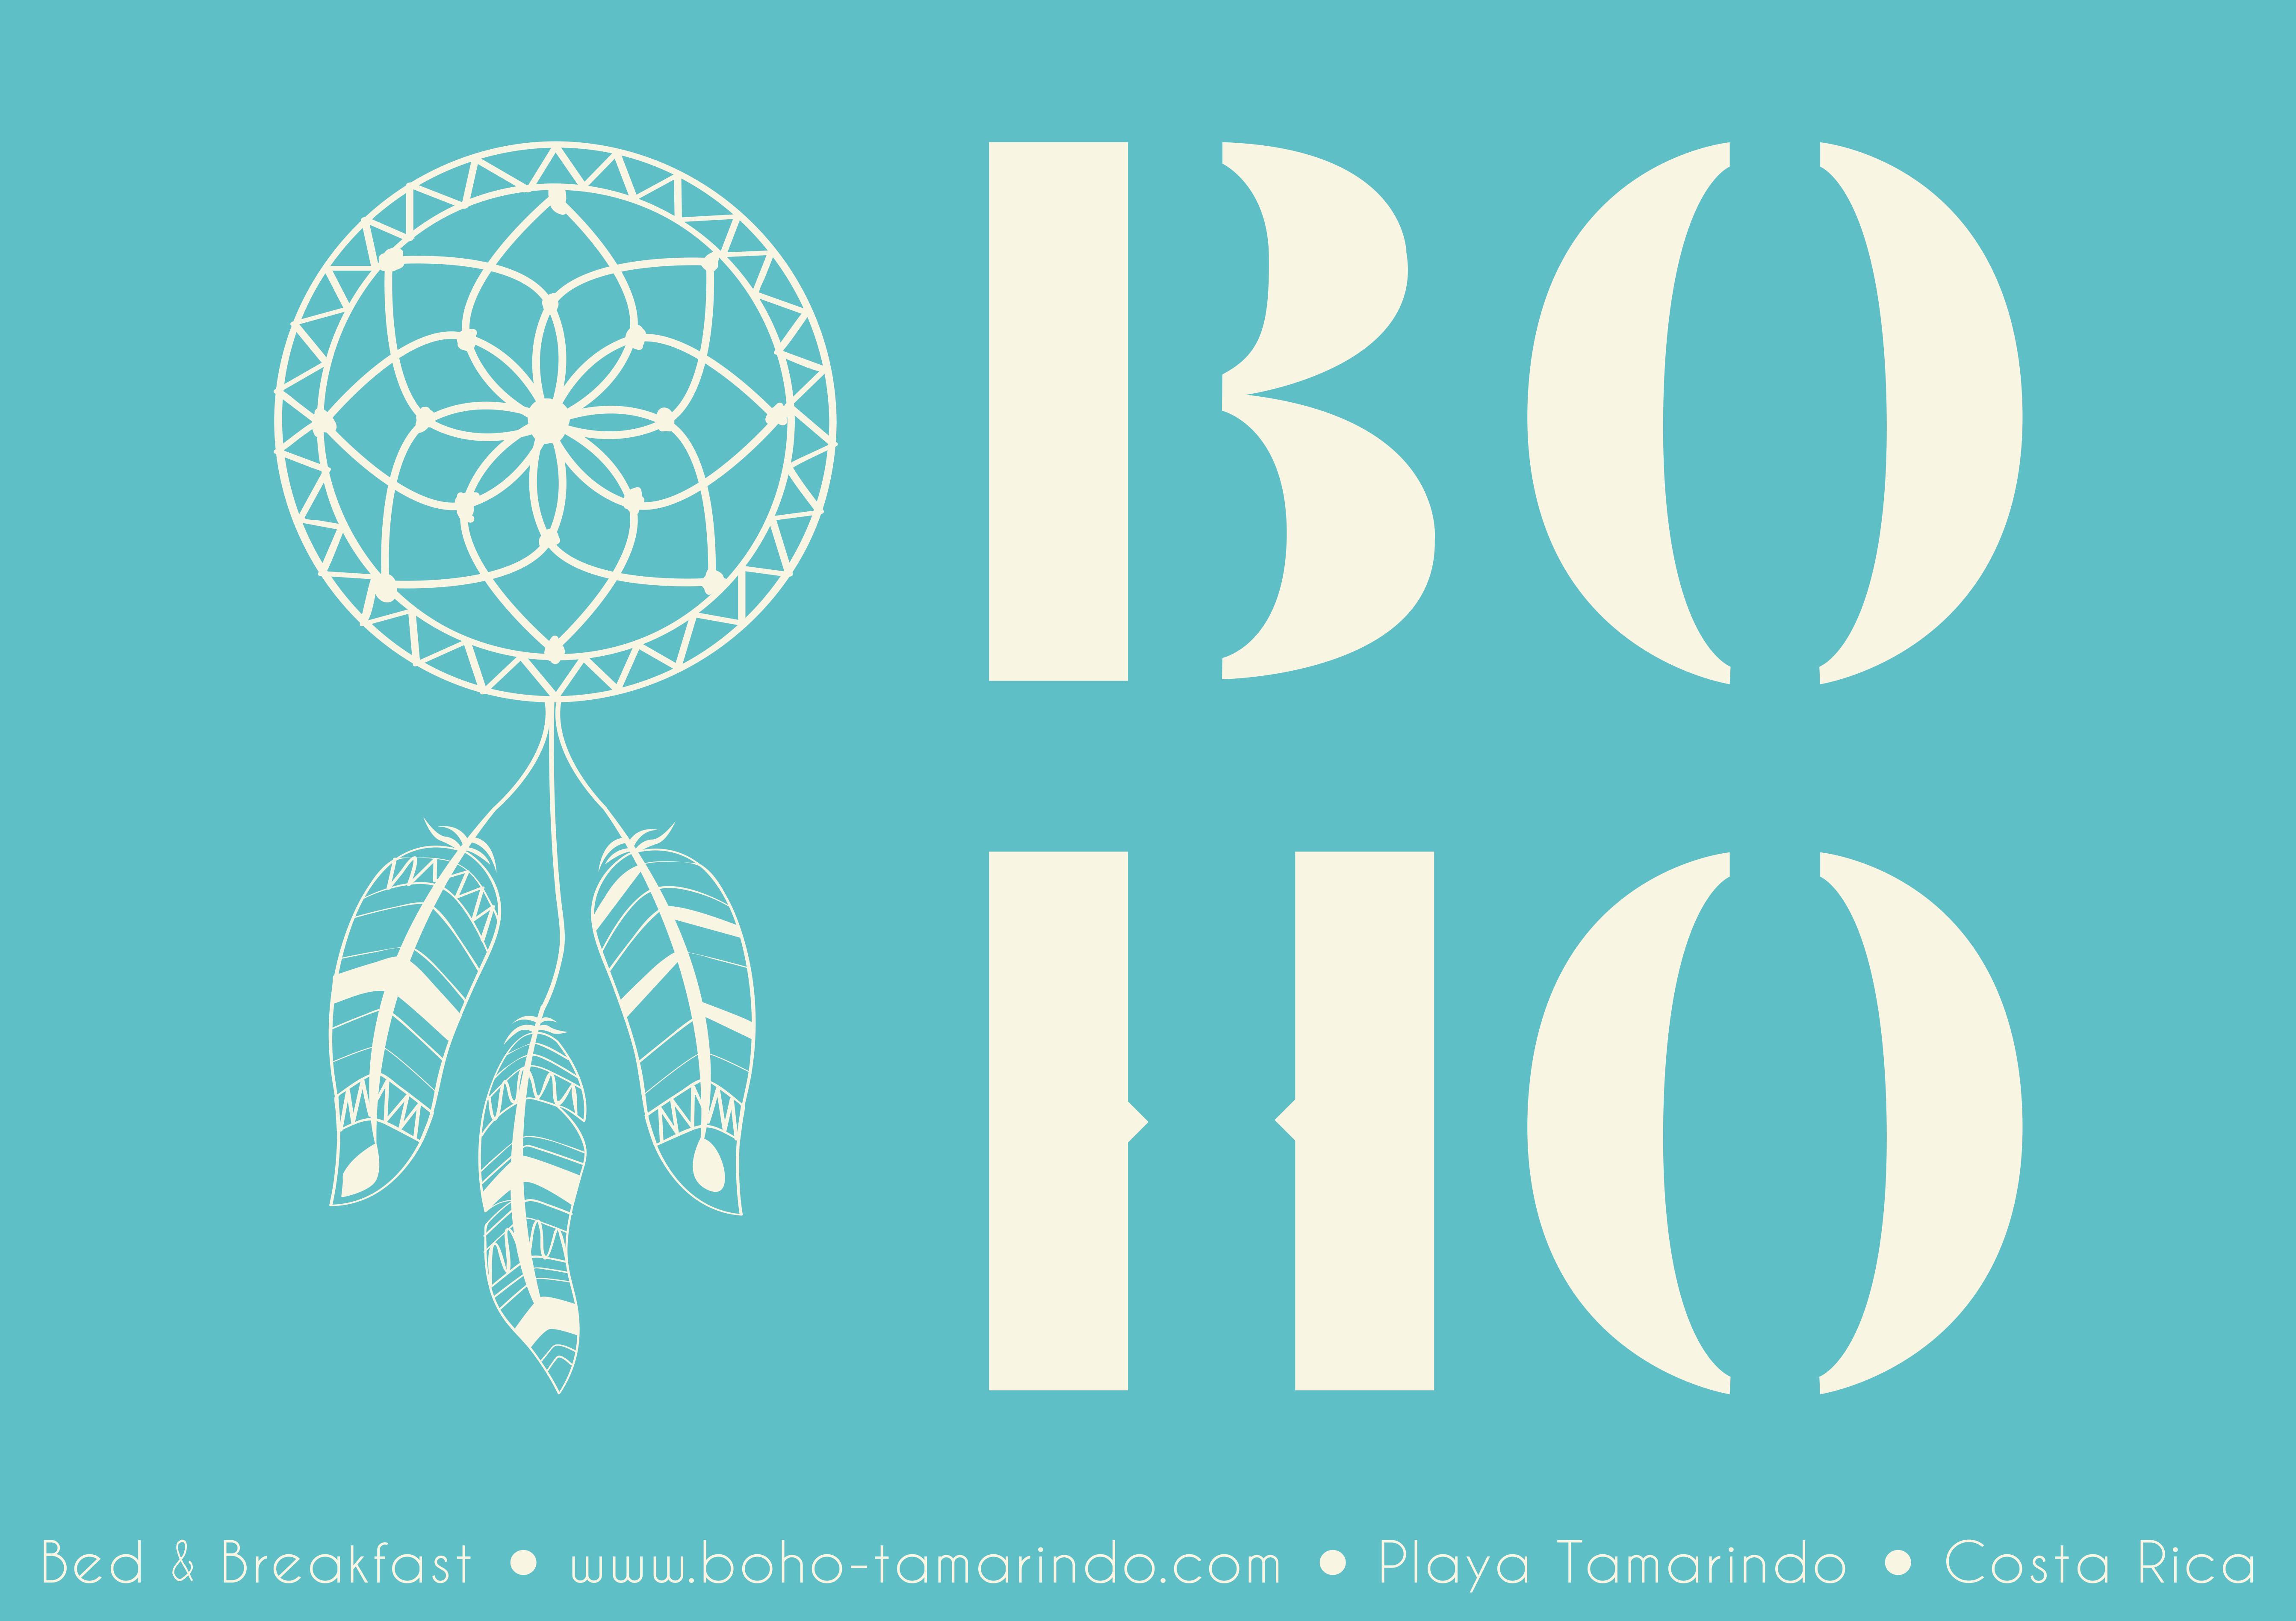 Visit Card BoHo Tamarindo Costa Rica